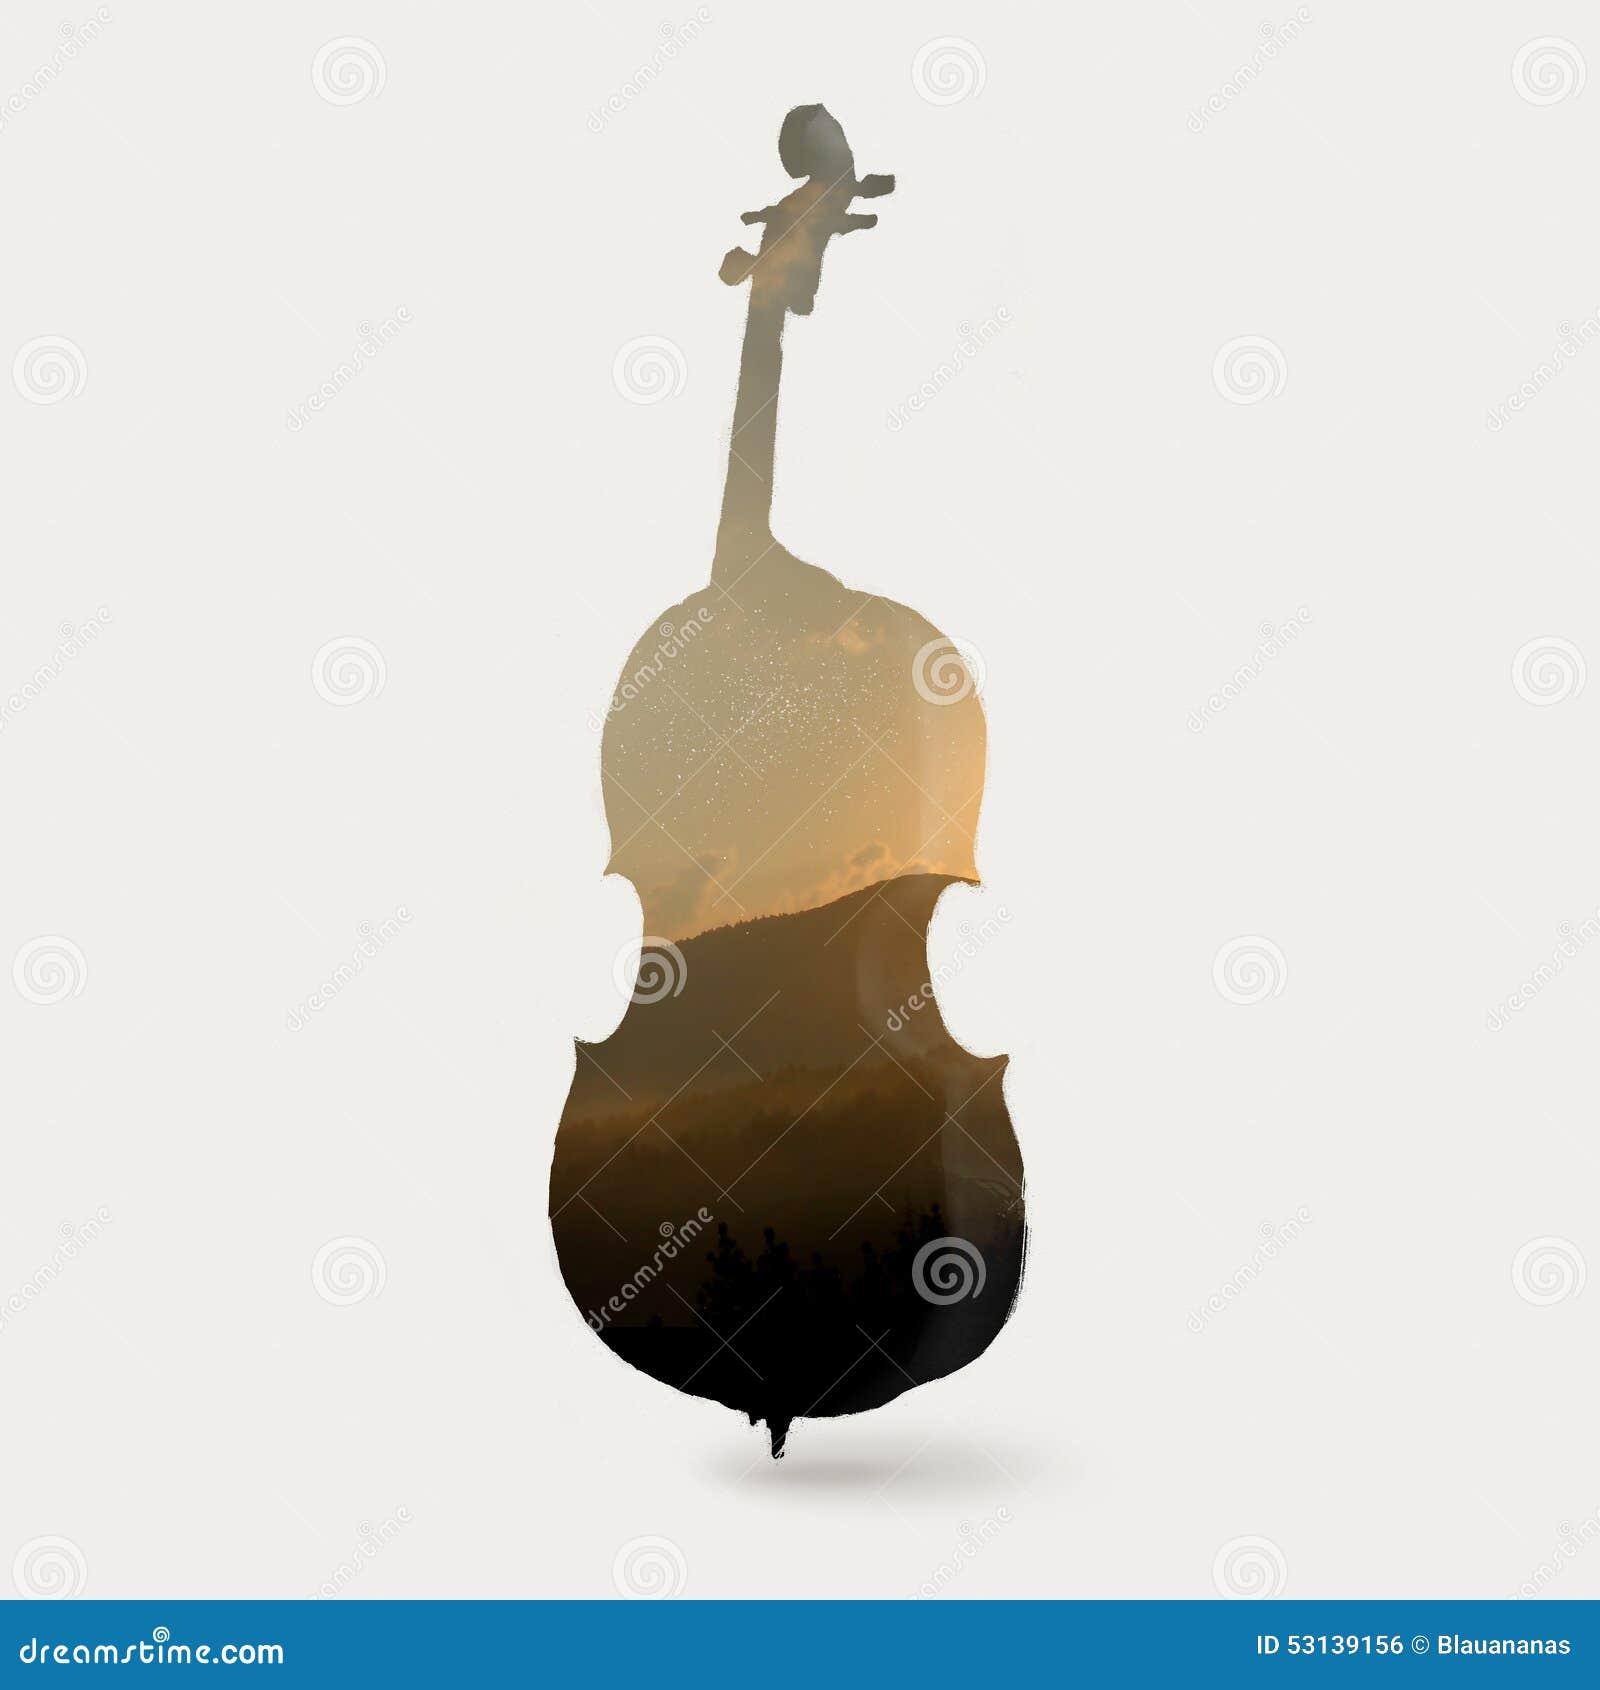 Cello cartoon cello player stock photography image 32561422 - Cello Silhouette Royalty Free Stock Image